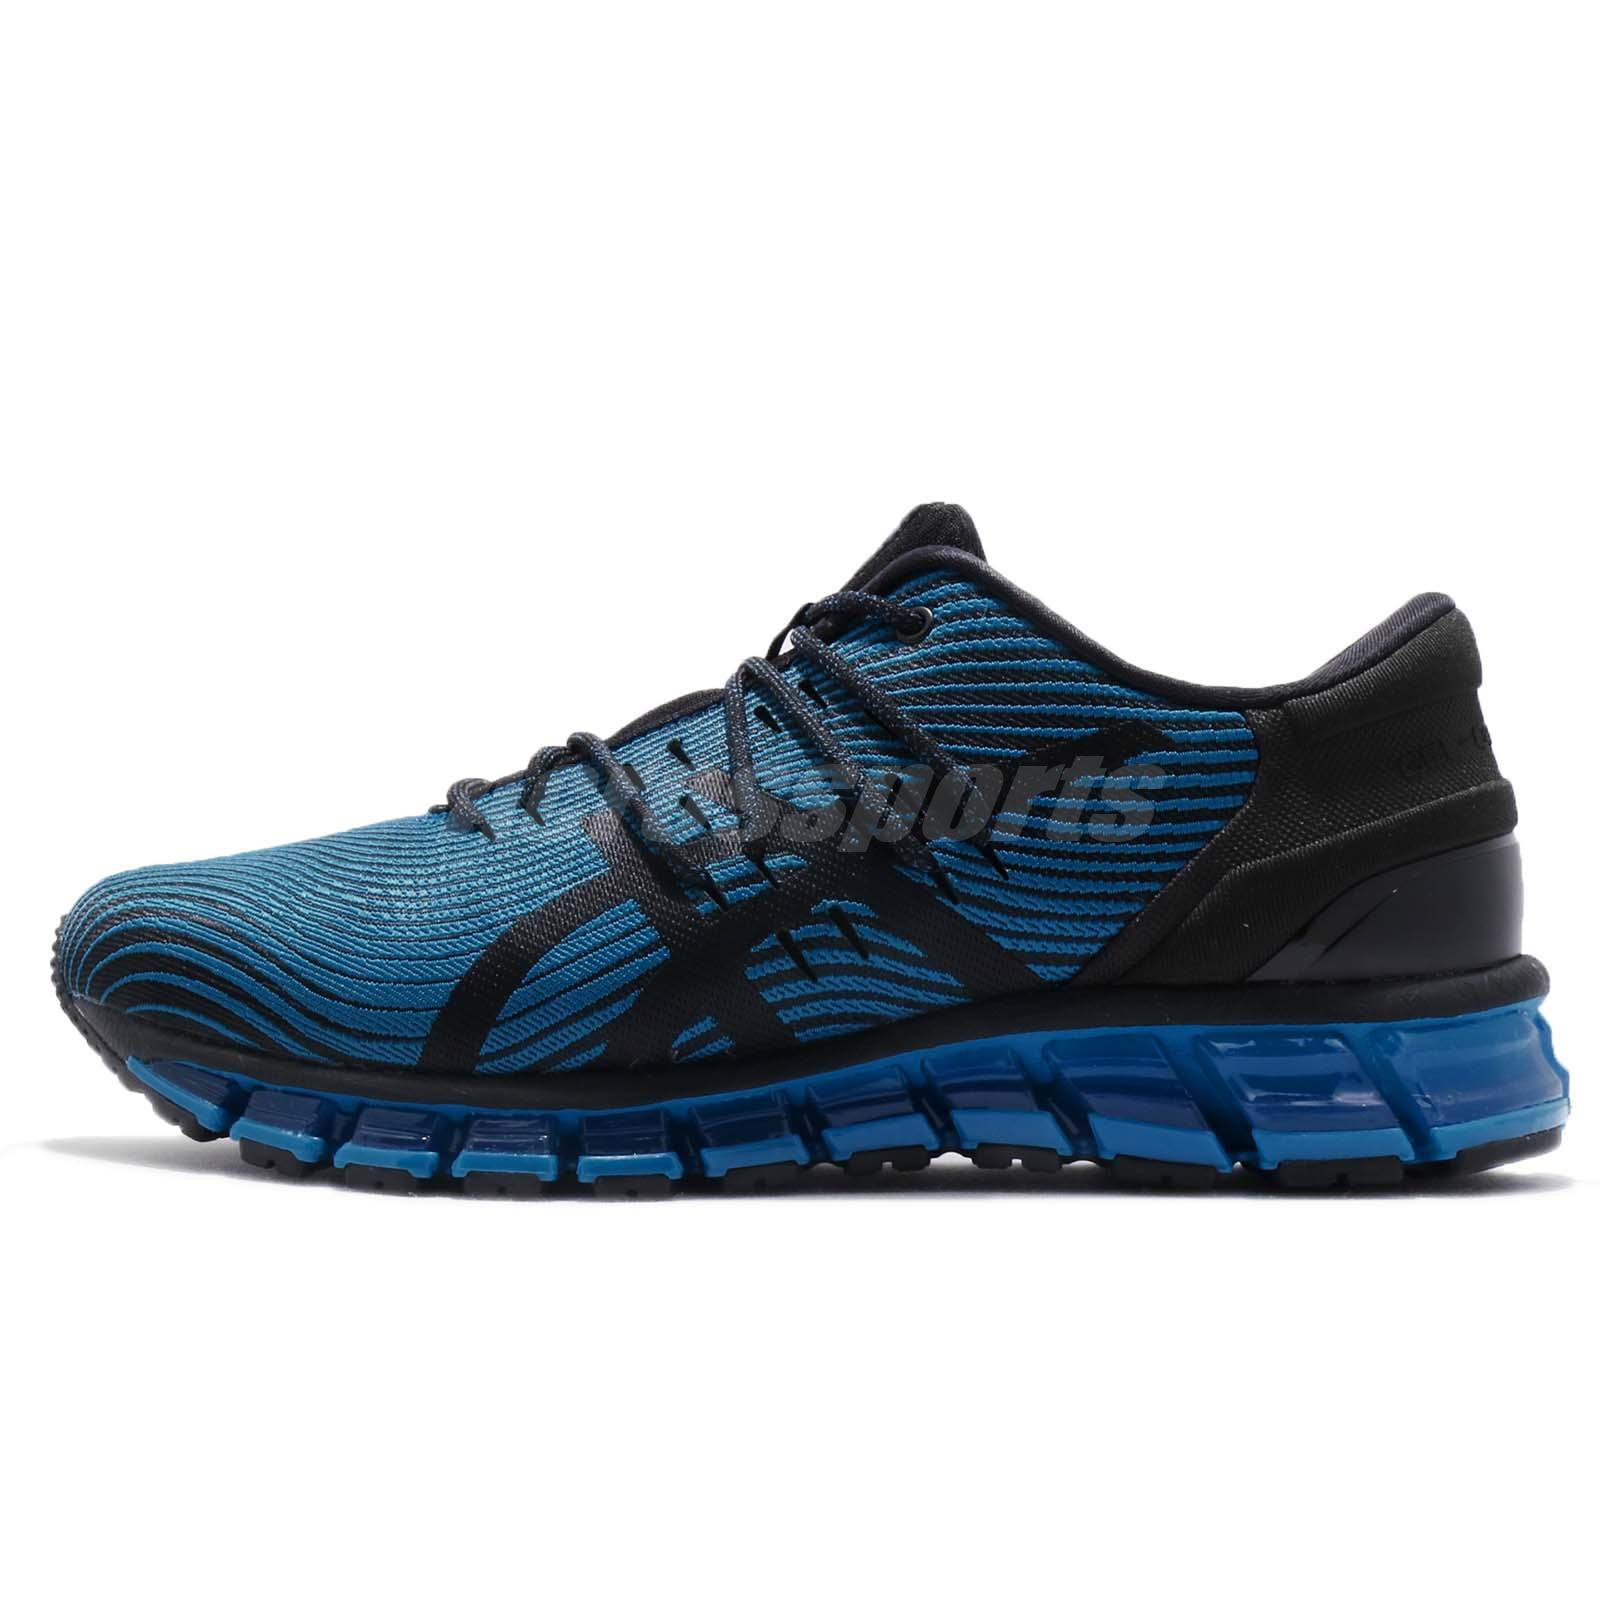 low cost 77e34 c12c1 Asics Gel-Quantum 360 4 Race Blue Black Men Running Shoes Sneakers  1021A028-400